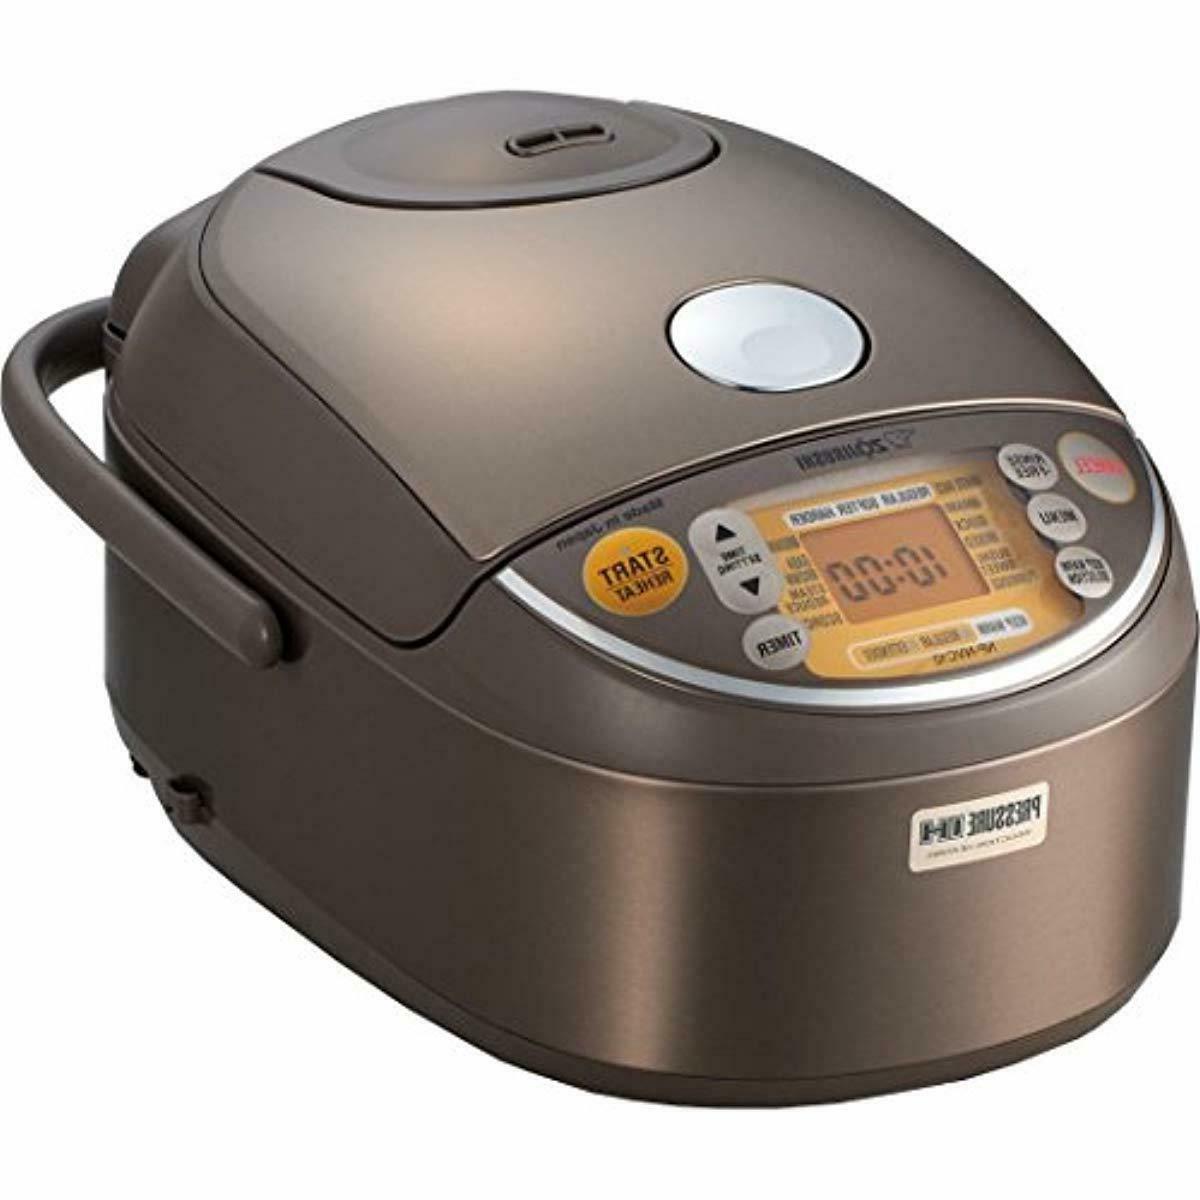 zojirushi induction heating pressure rice cooker warmer